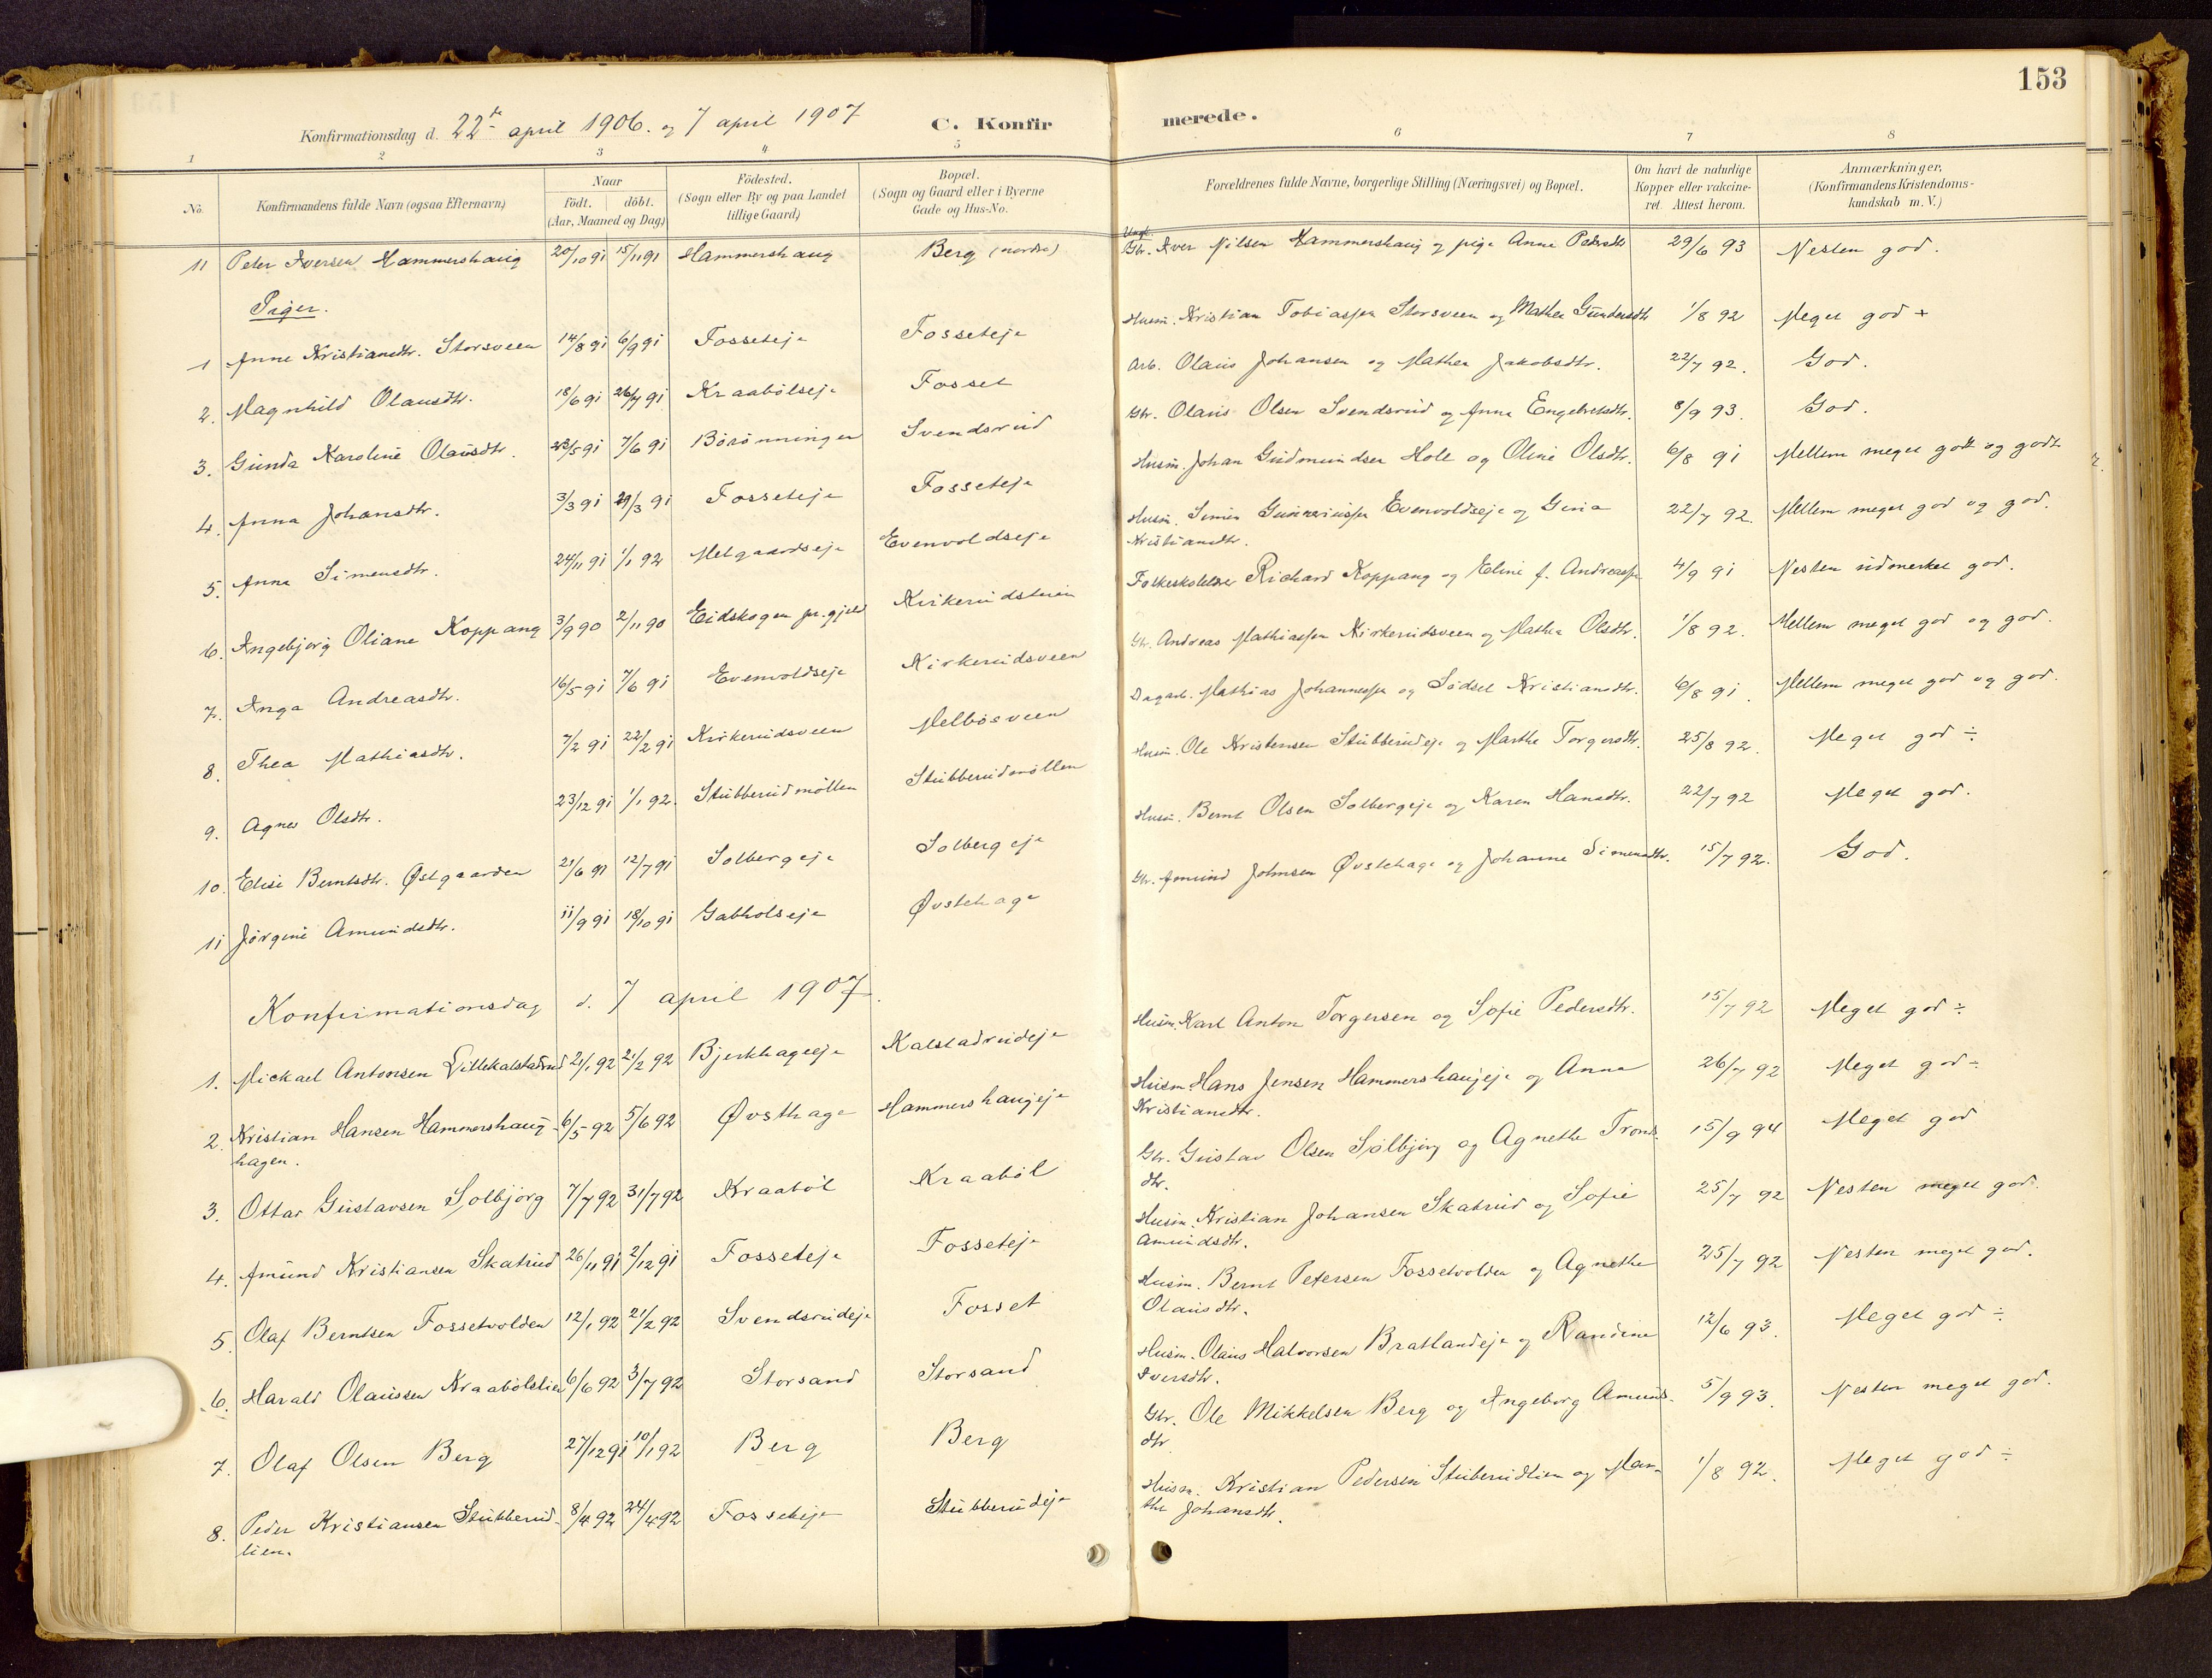 SAH, Vestre Gausdal prestekontor, Ministerialbok nr. 1, 1887-1914, s. 153